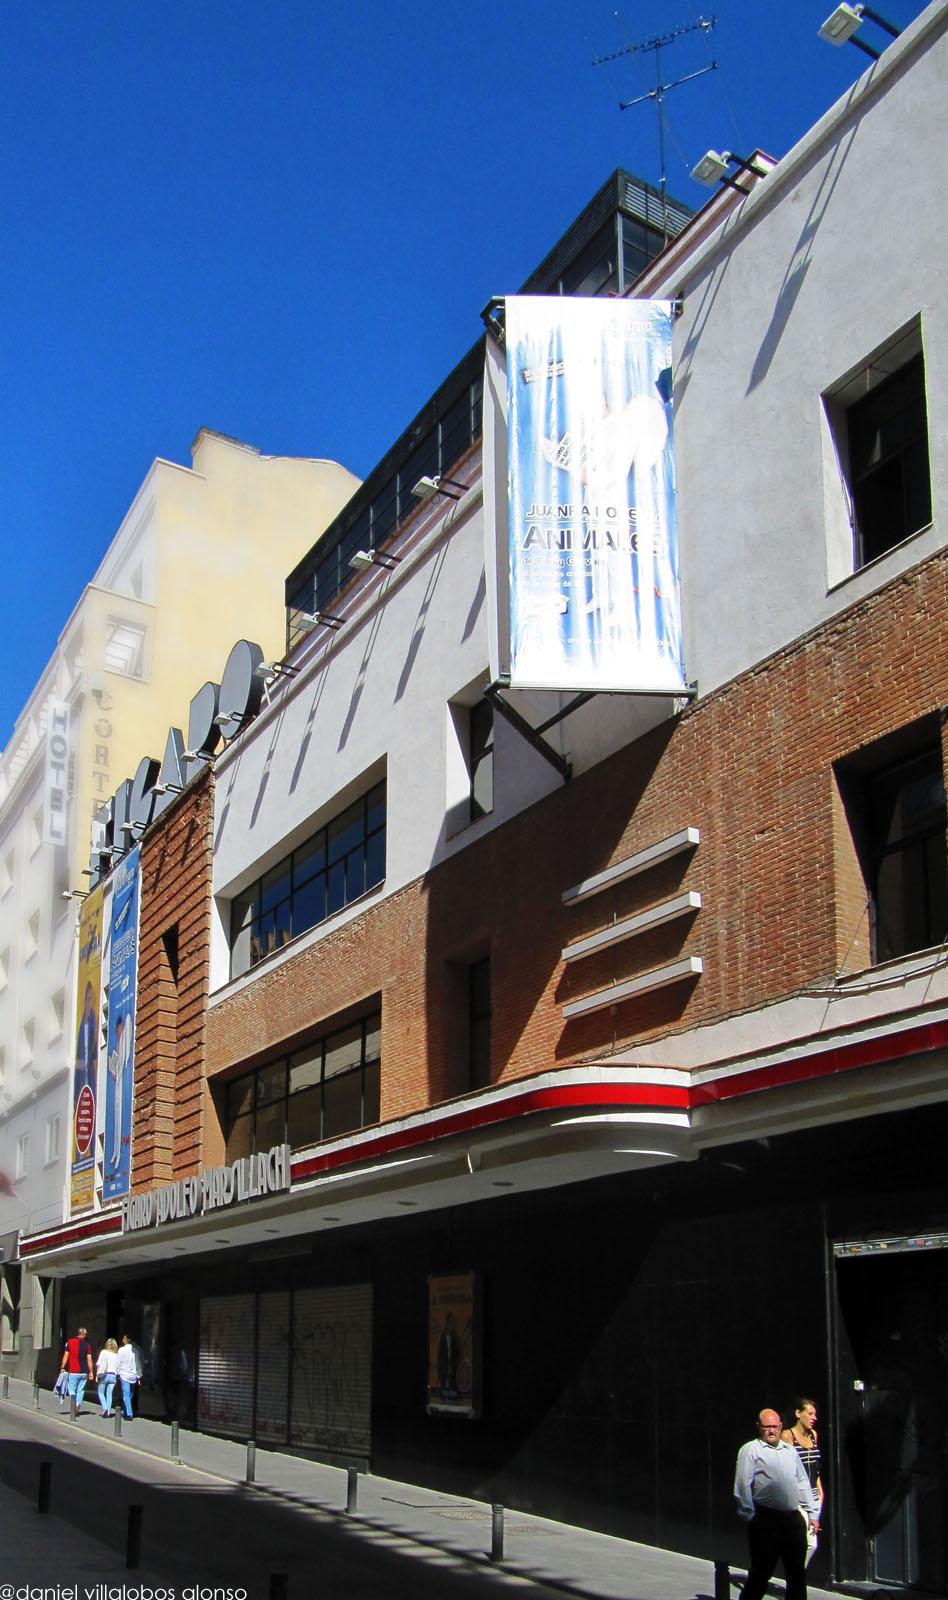 danielvillalobos-cines-digitalphotographies-modernarchitecture-19